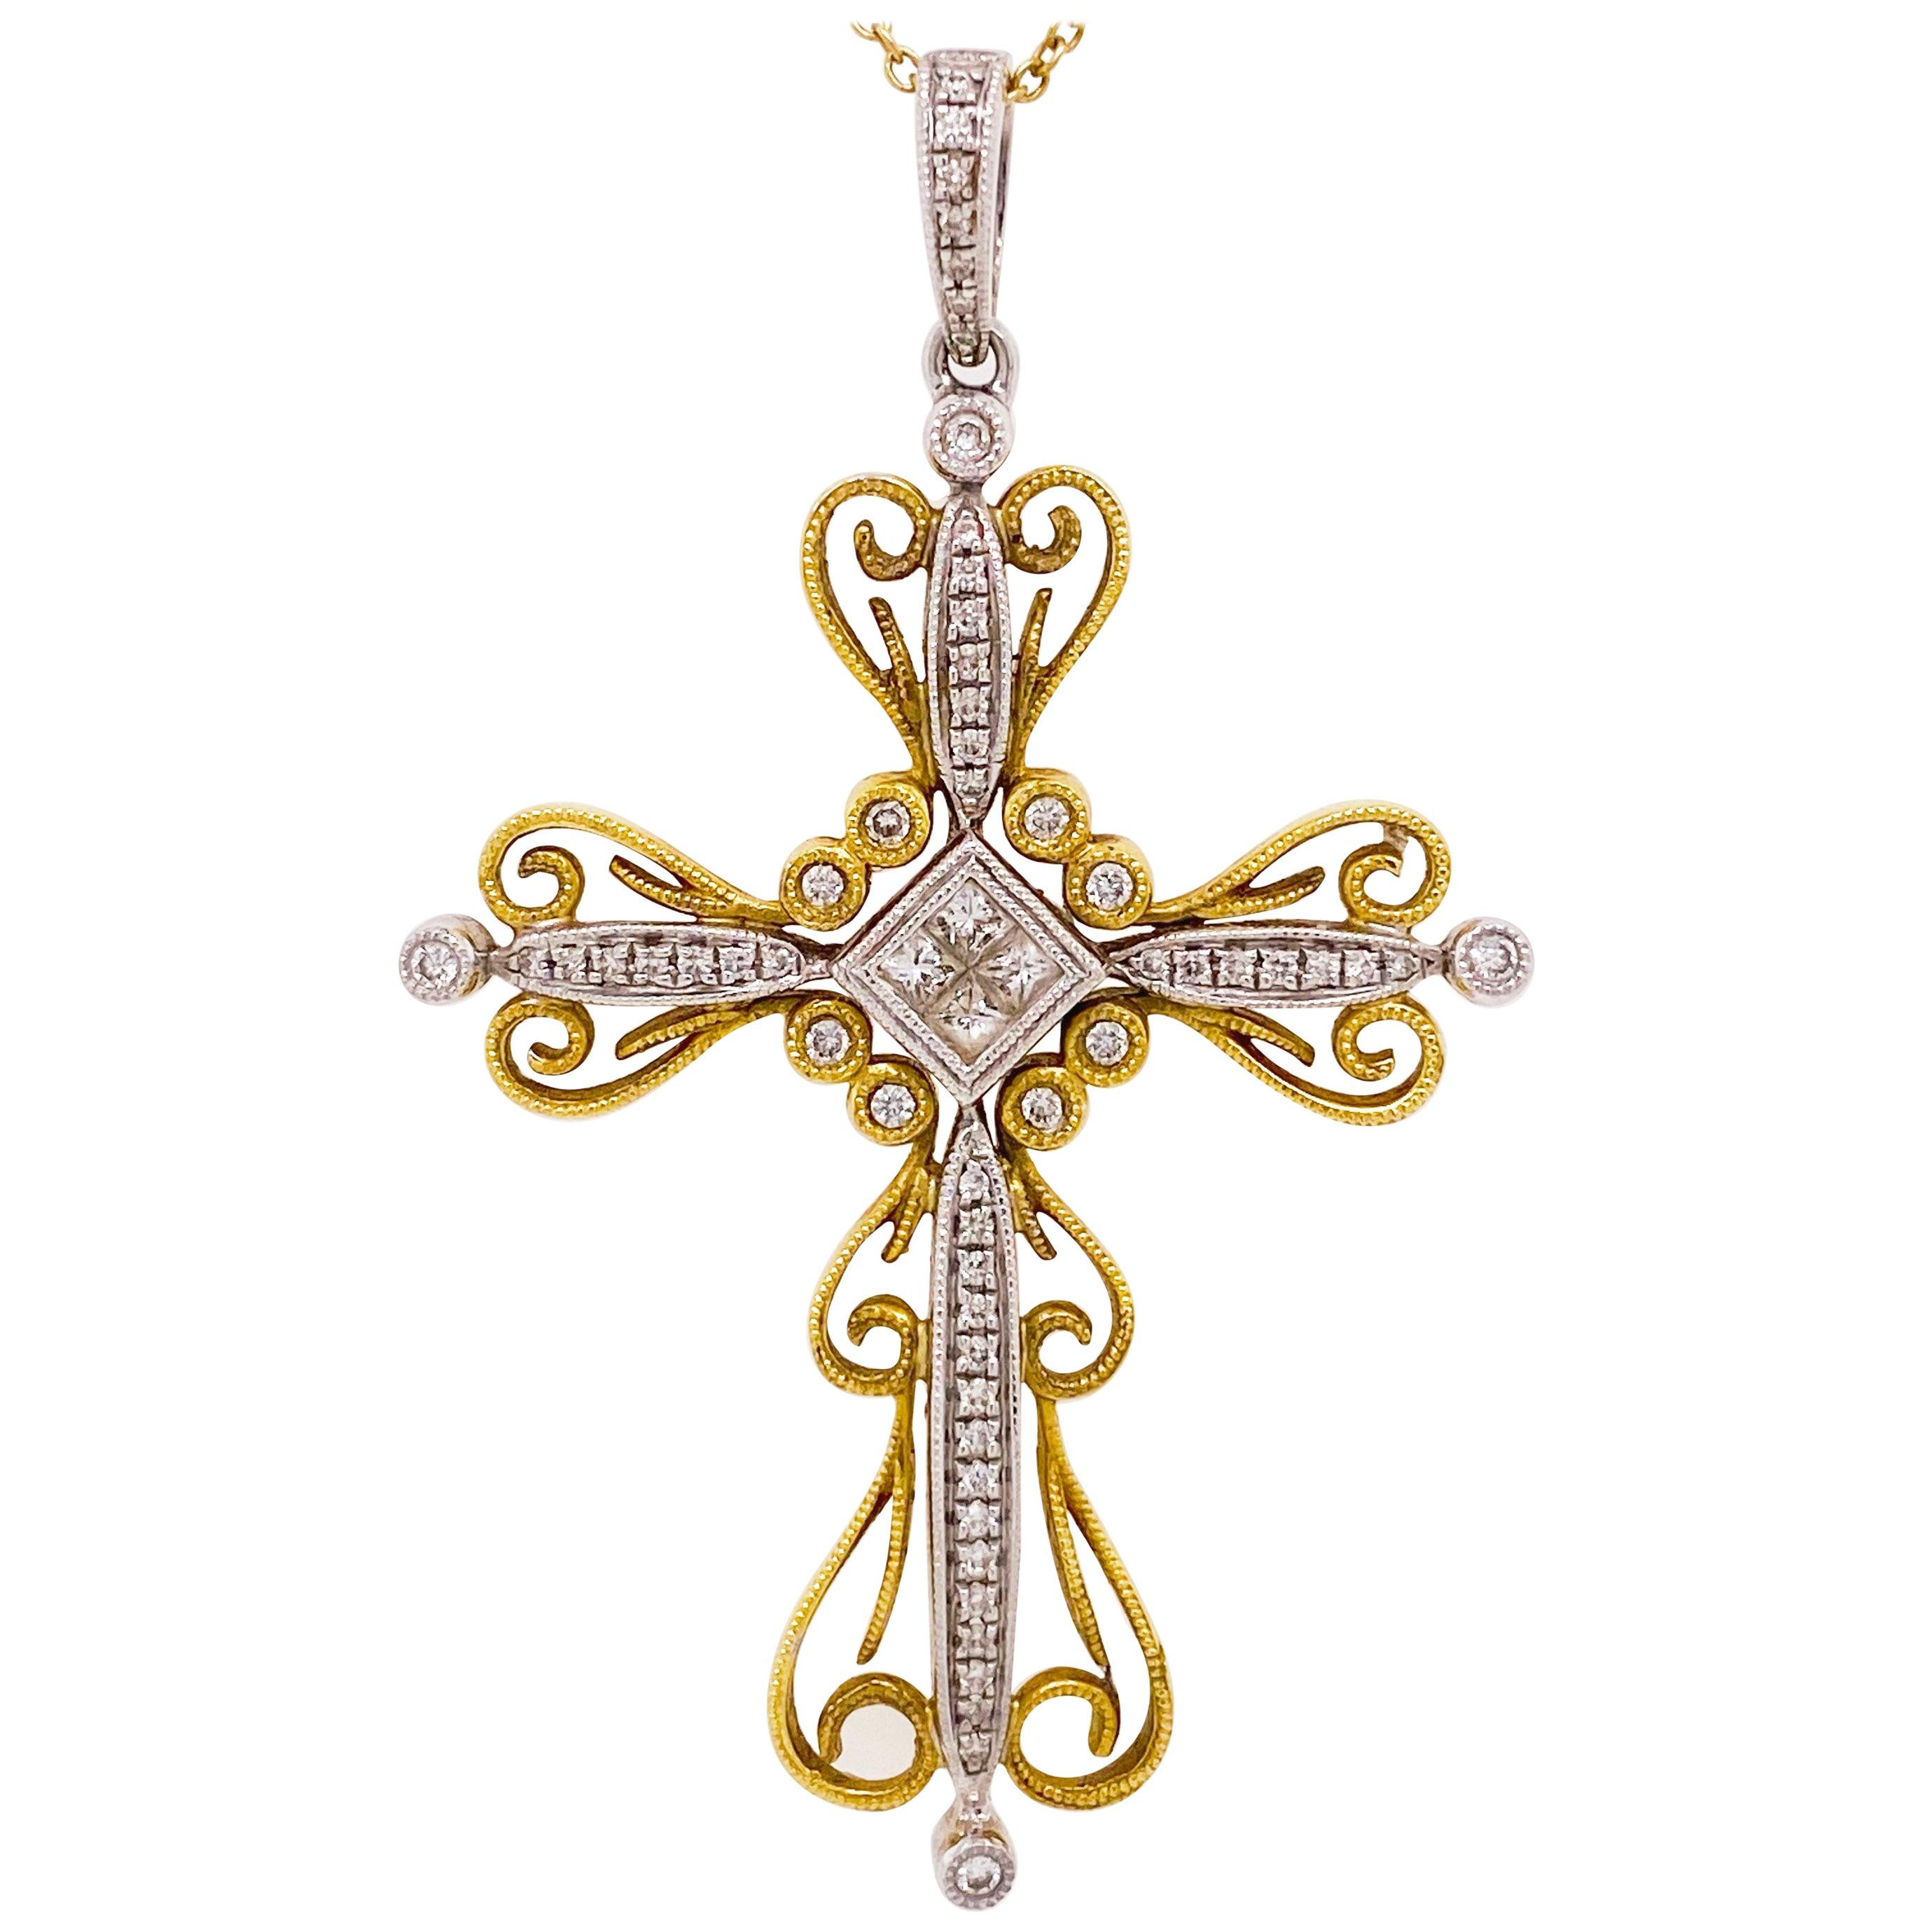 Diamond Cross Necklace, 14 Karat Yellow White Gold Diamond Cross Pendant Chain